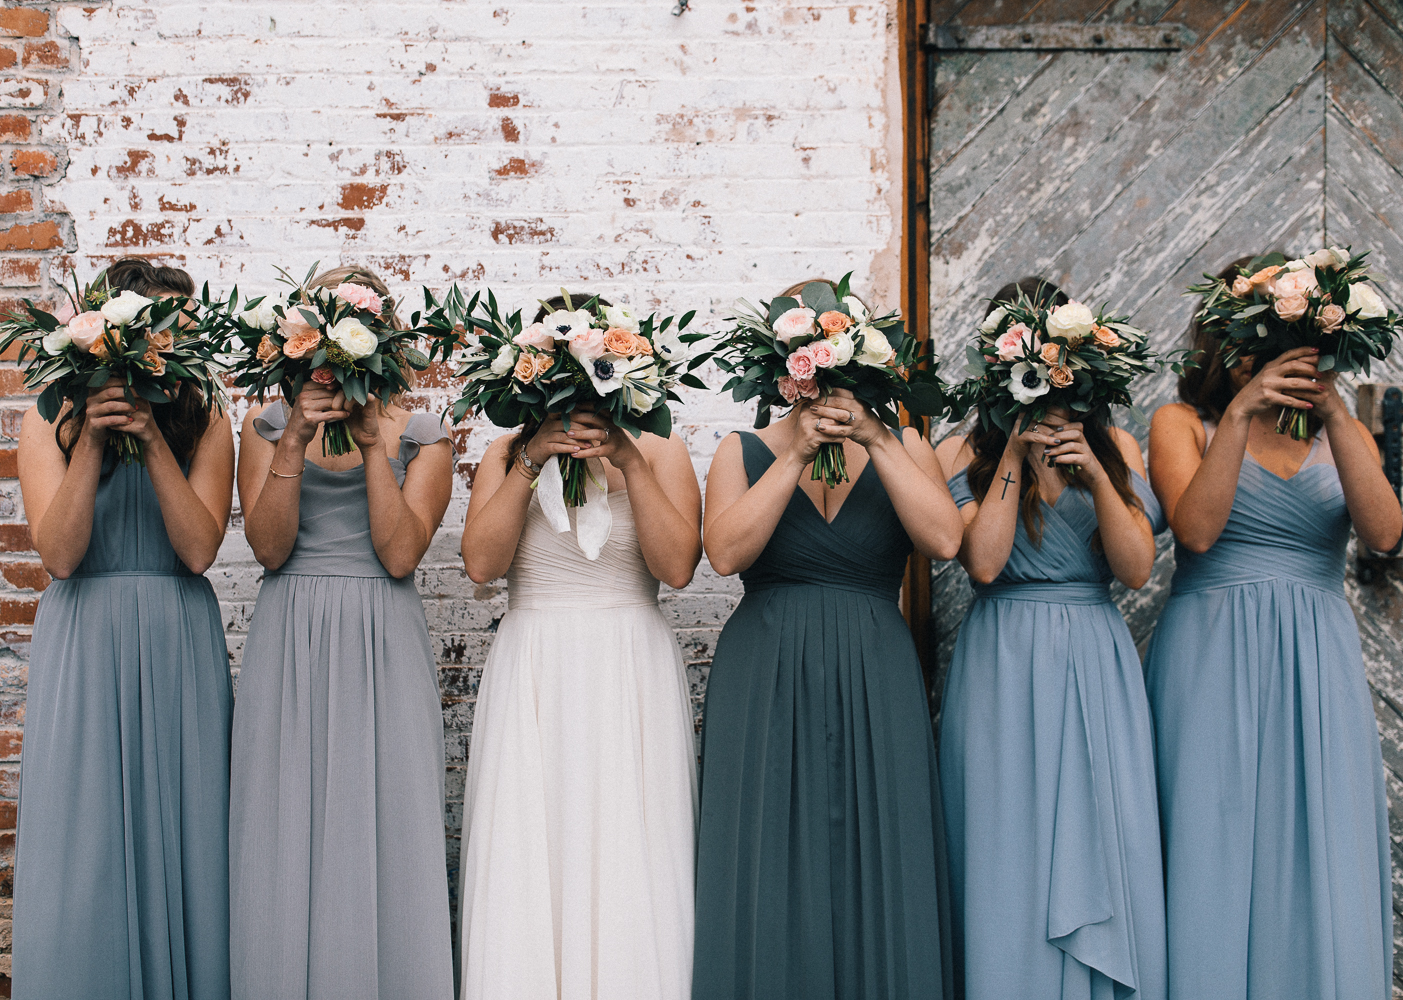 2018_03_ 10The Richardson Wedding Blog Photos Edited For Web 0051.jpg